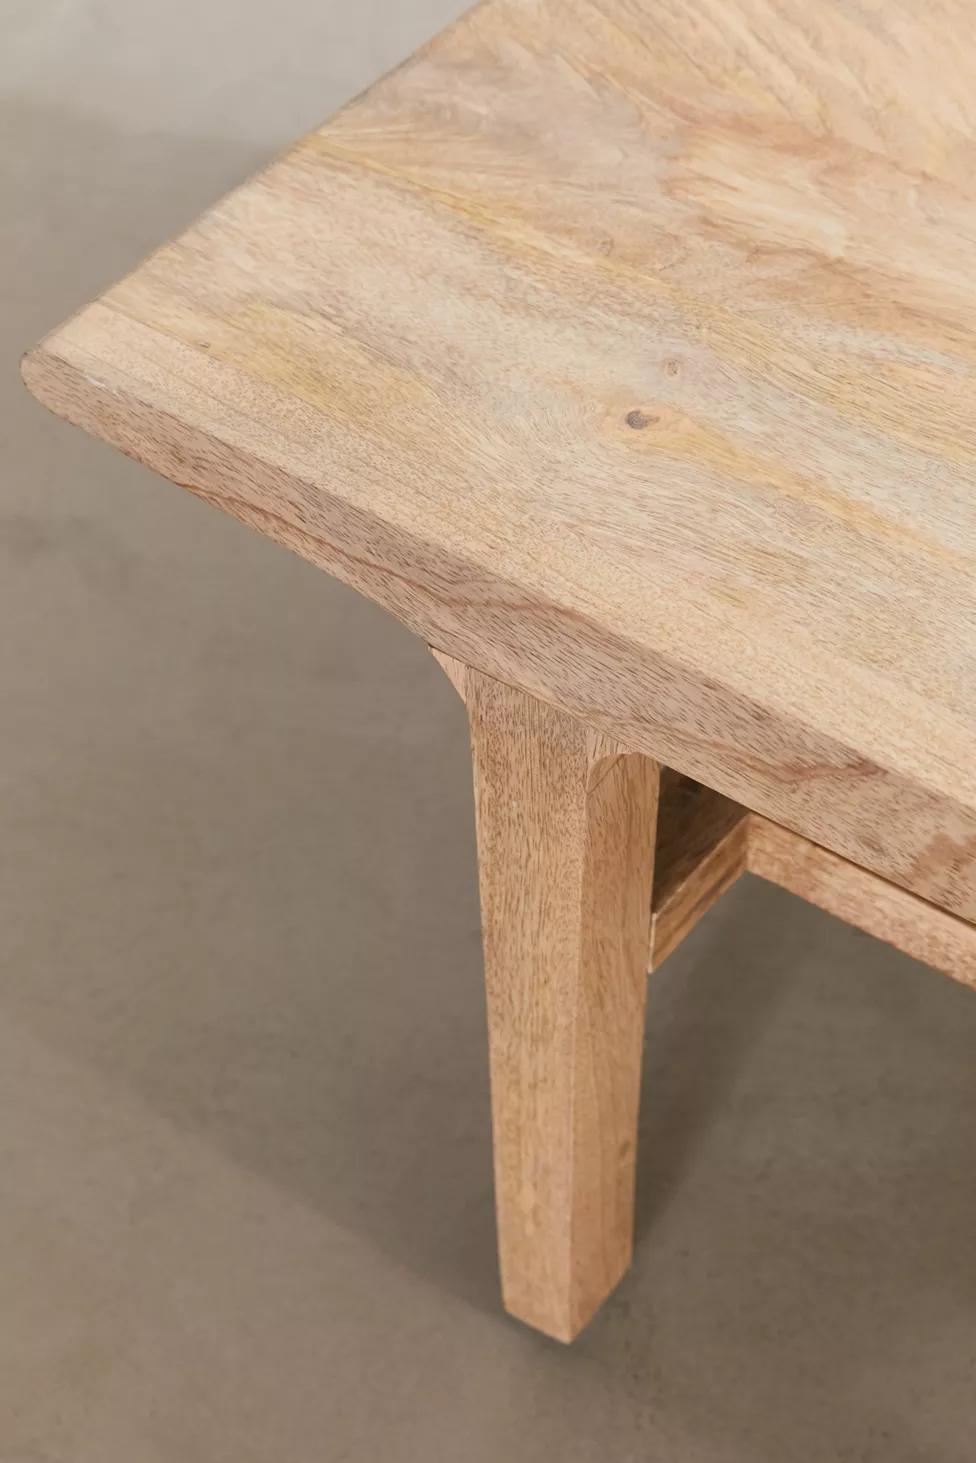 Wyatt Coffee Table Natural Wood Coffee Table Coffee Table Coffee Table Wood [ 1463 x 976 Pixel ]